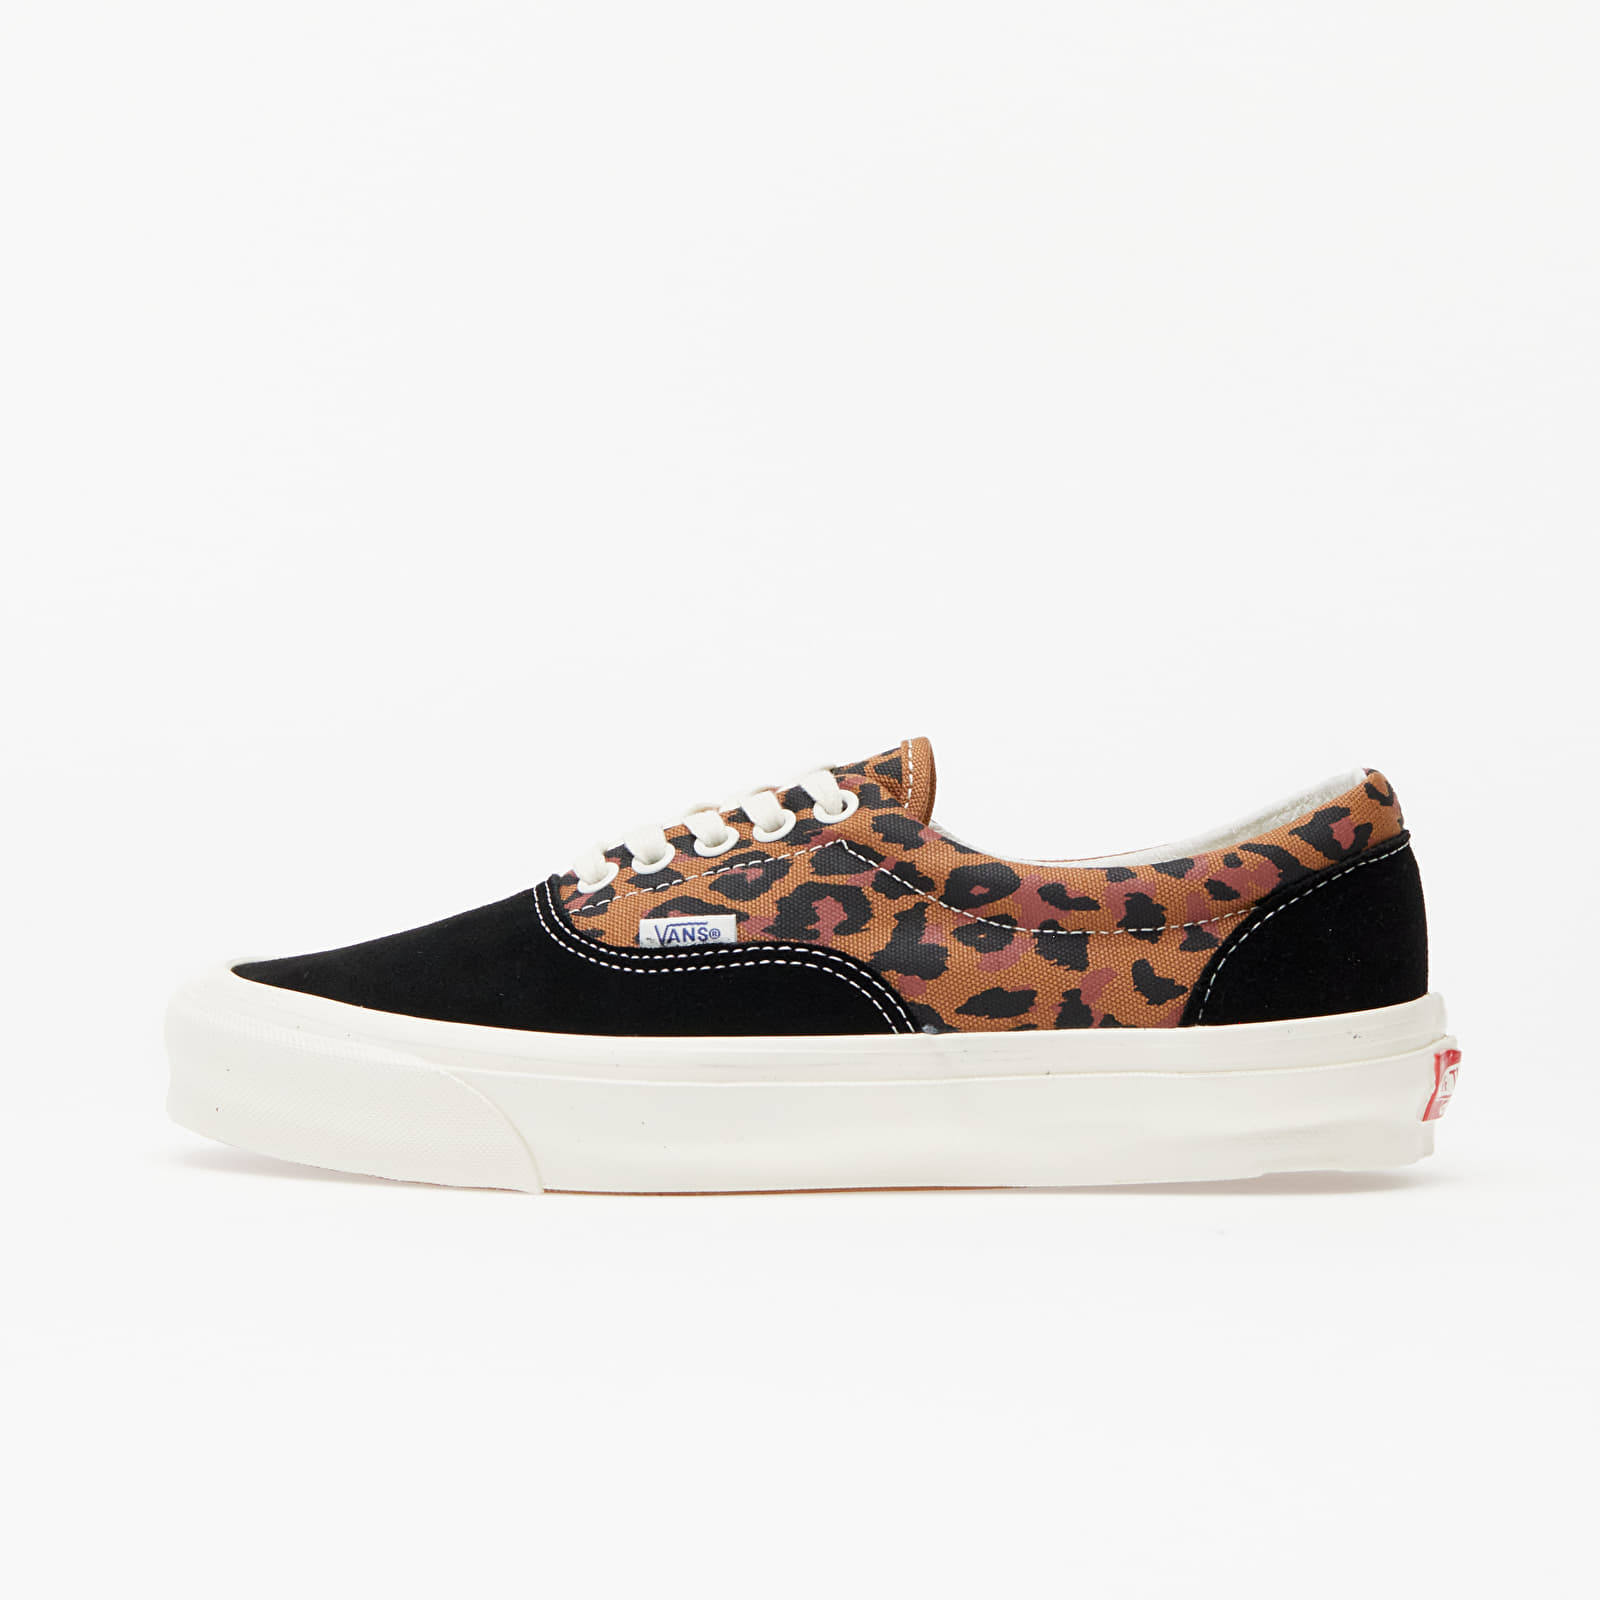 Vans OG Era LX (Suede/ Canvas) Leopard/ Marshmallow | Footshop